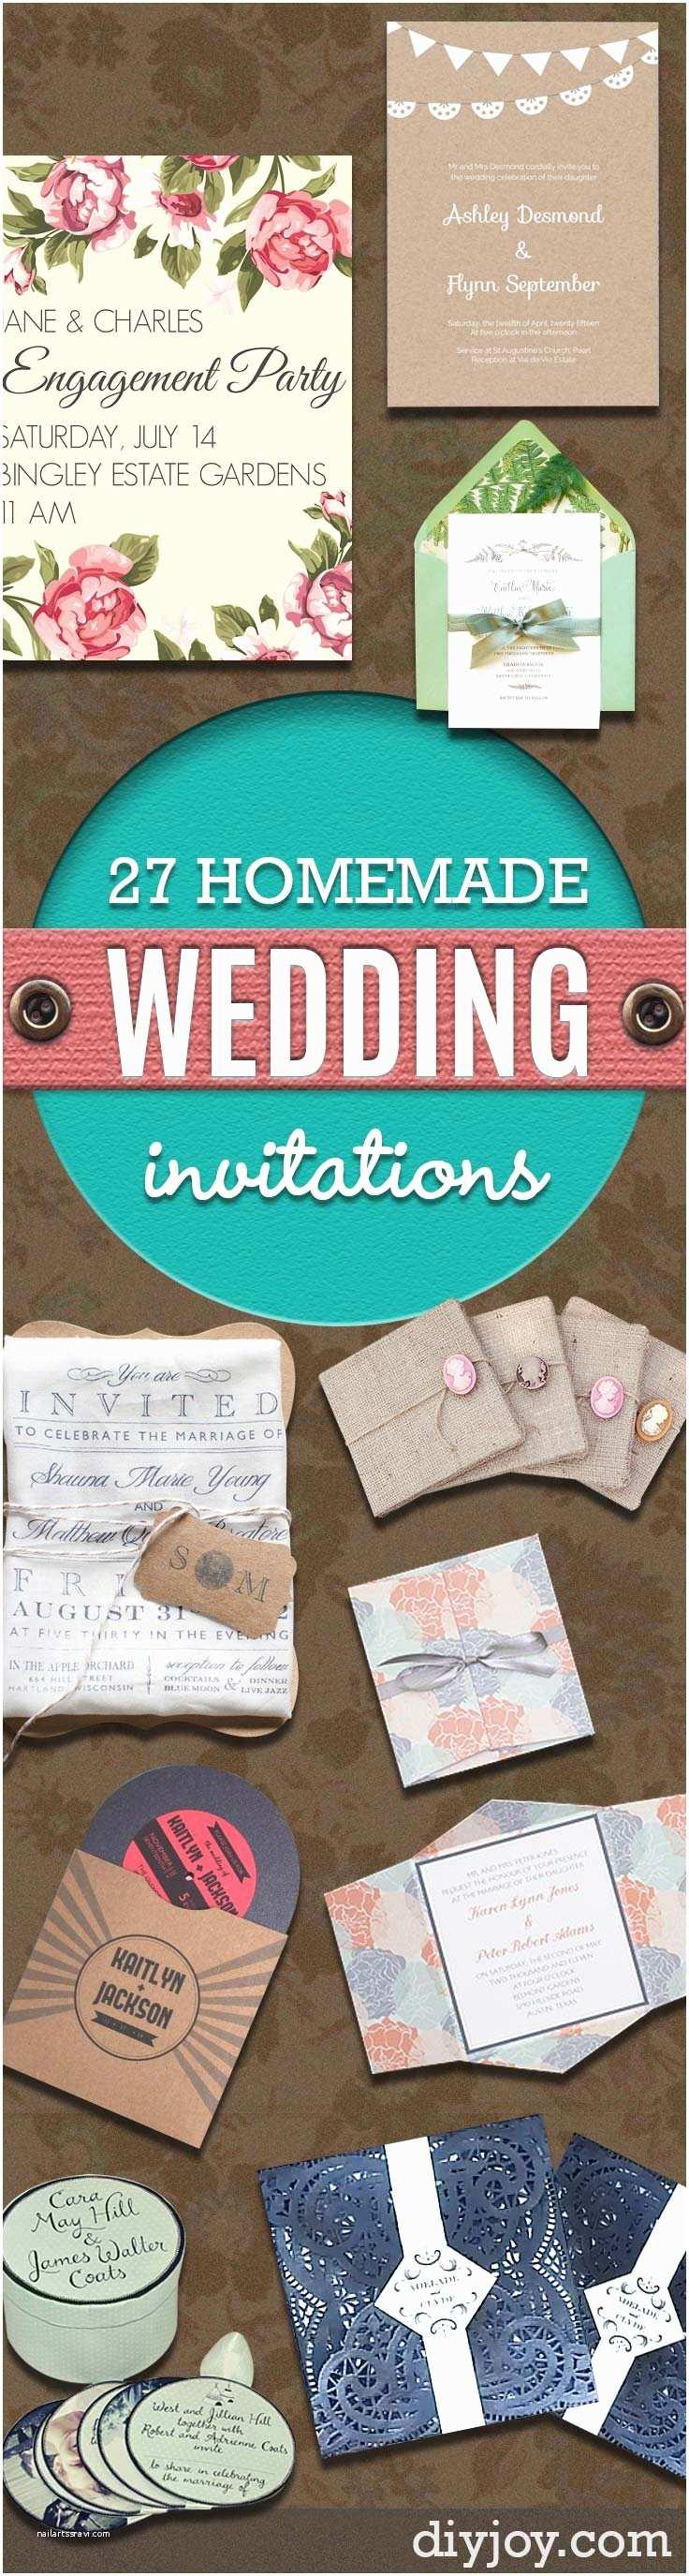 Diy Vintage Wedding Invitation Ideas 27 Fabulous Diy Wedding Invitation Ideas